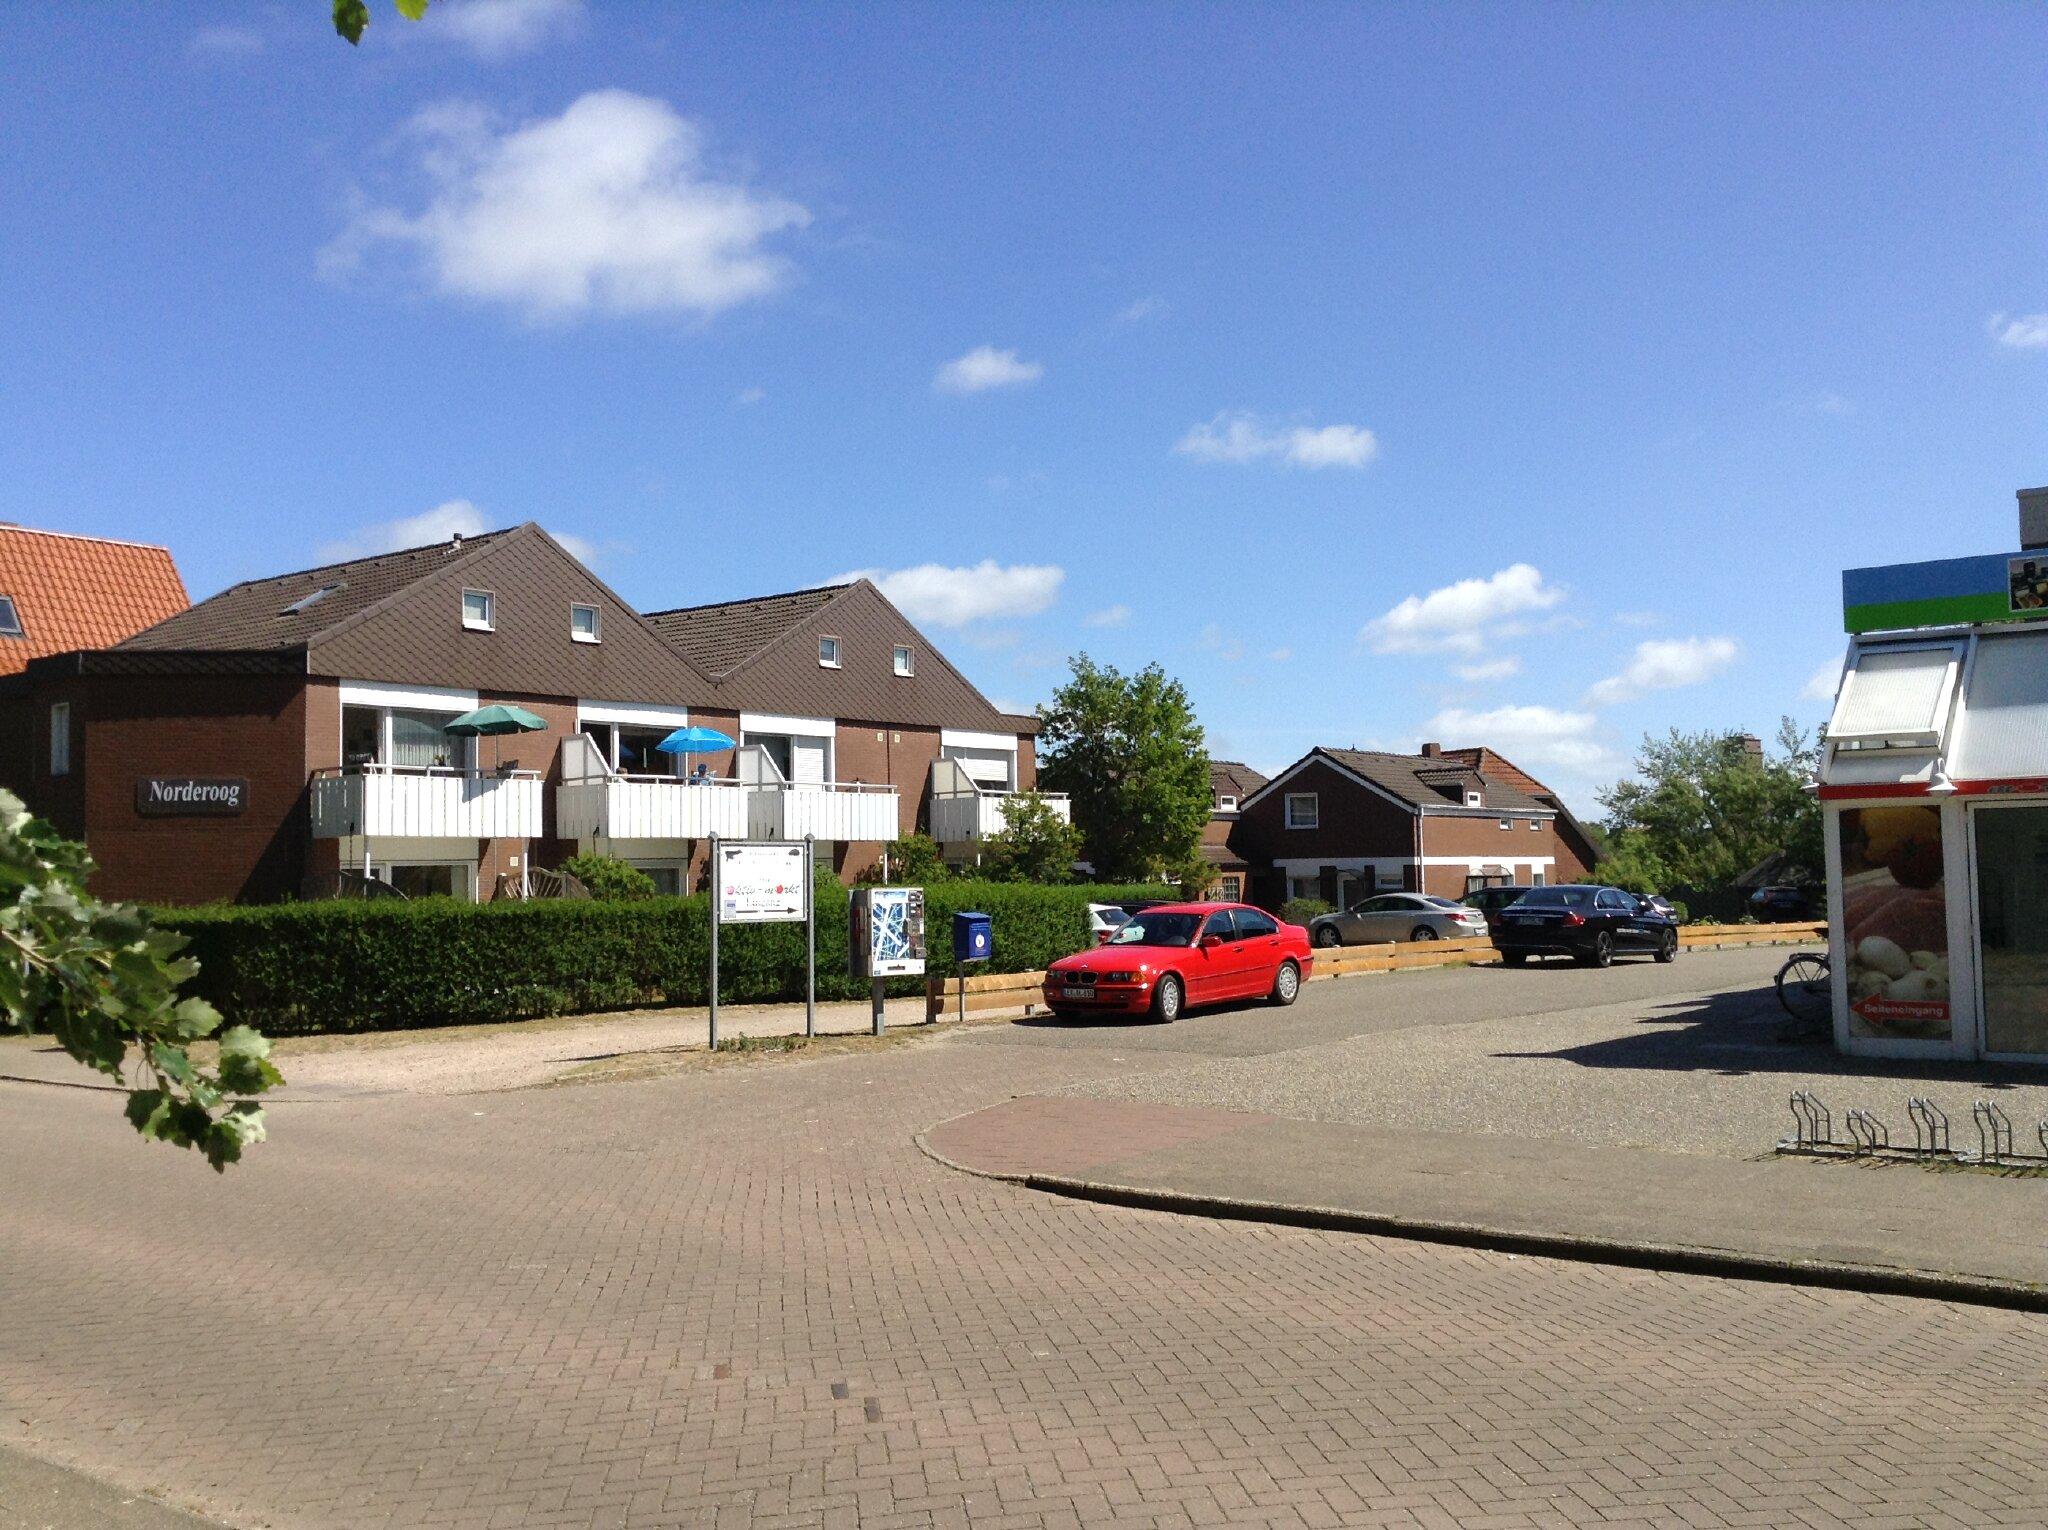 Haus Norderoog, Hindenburgstr.56